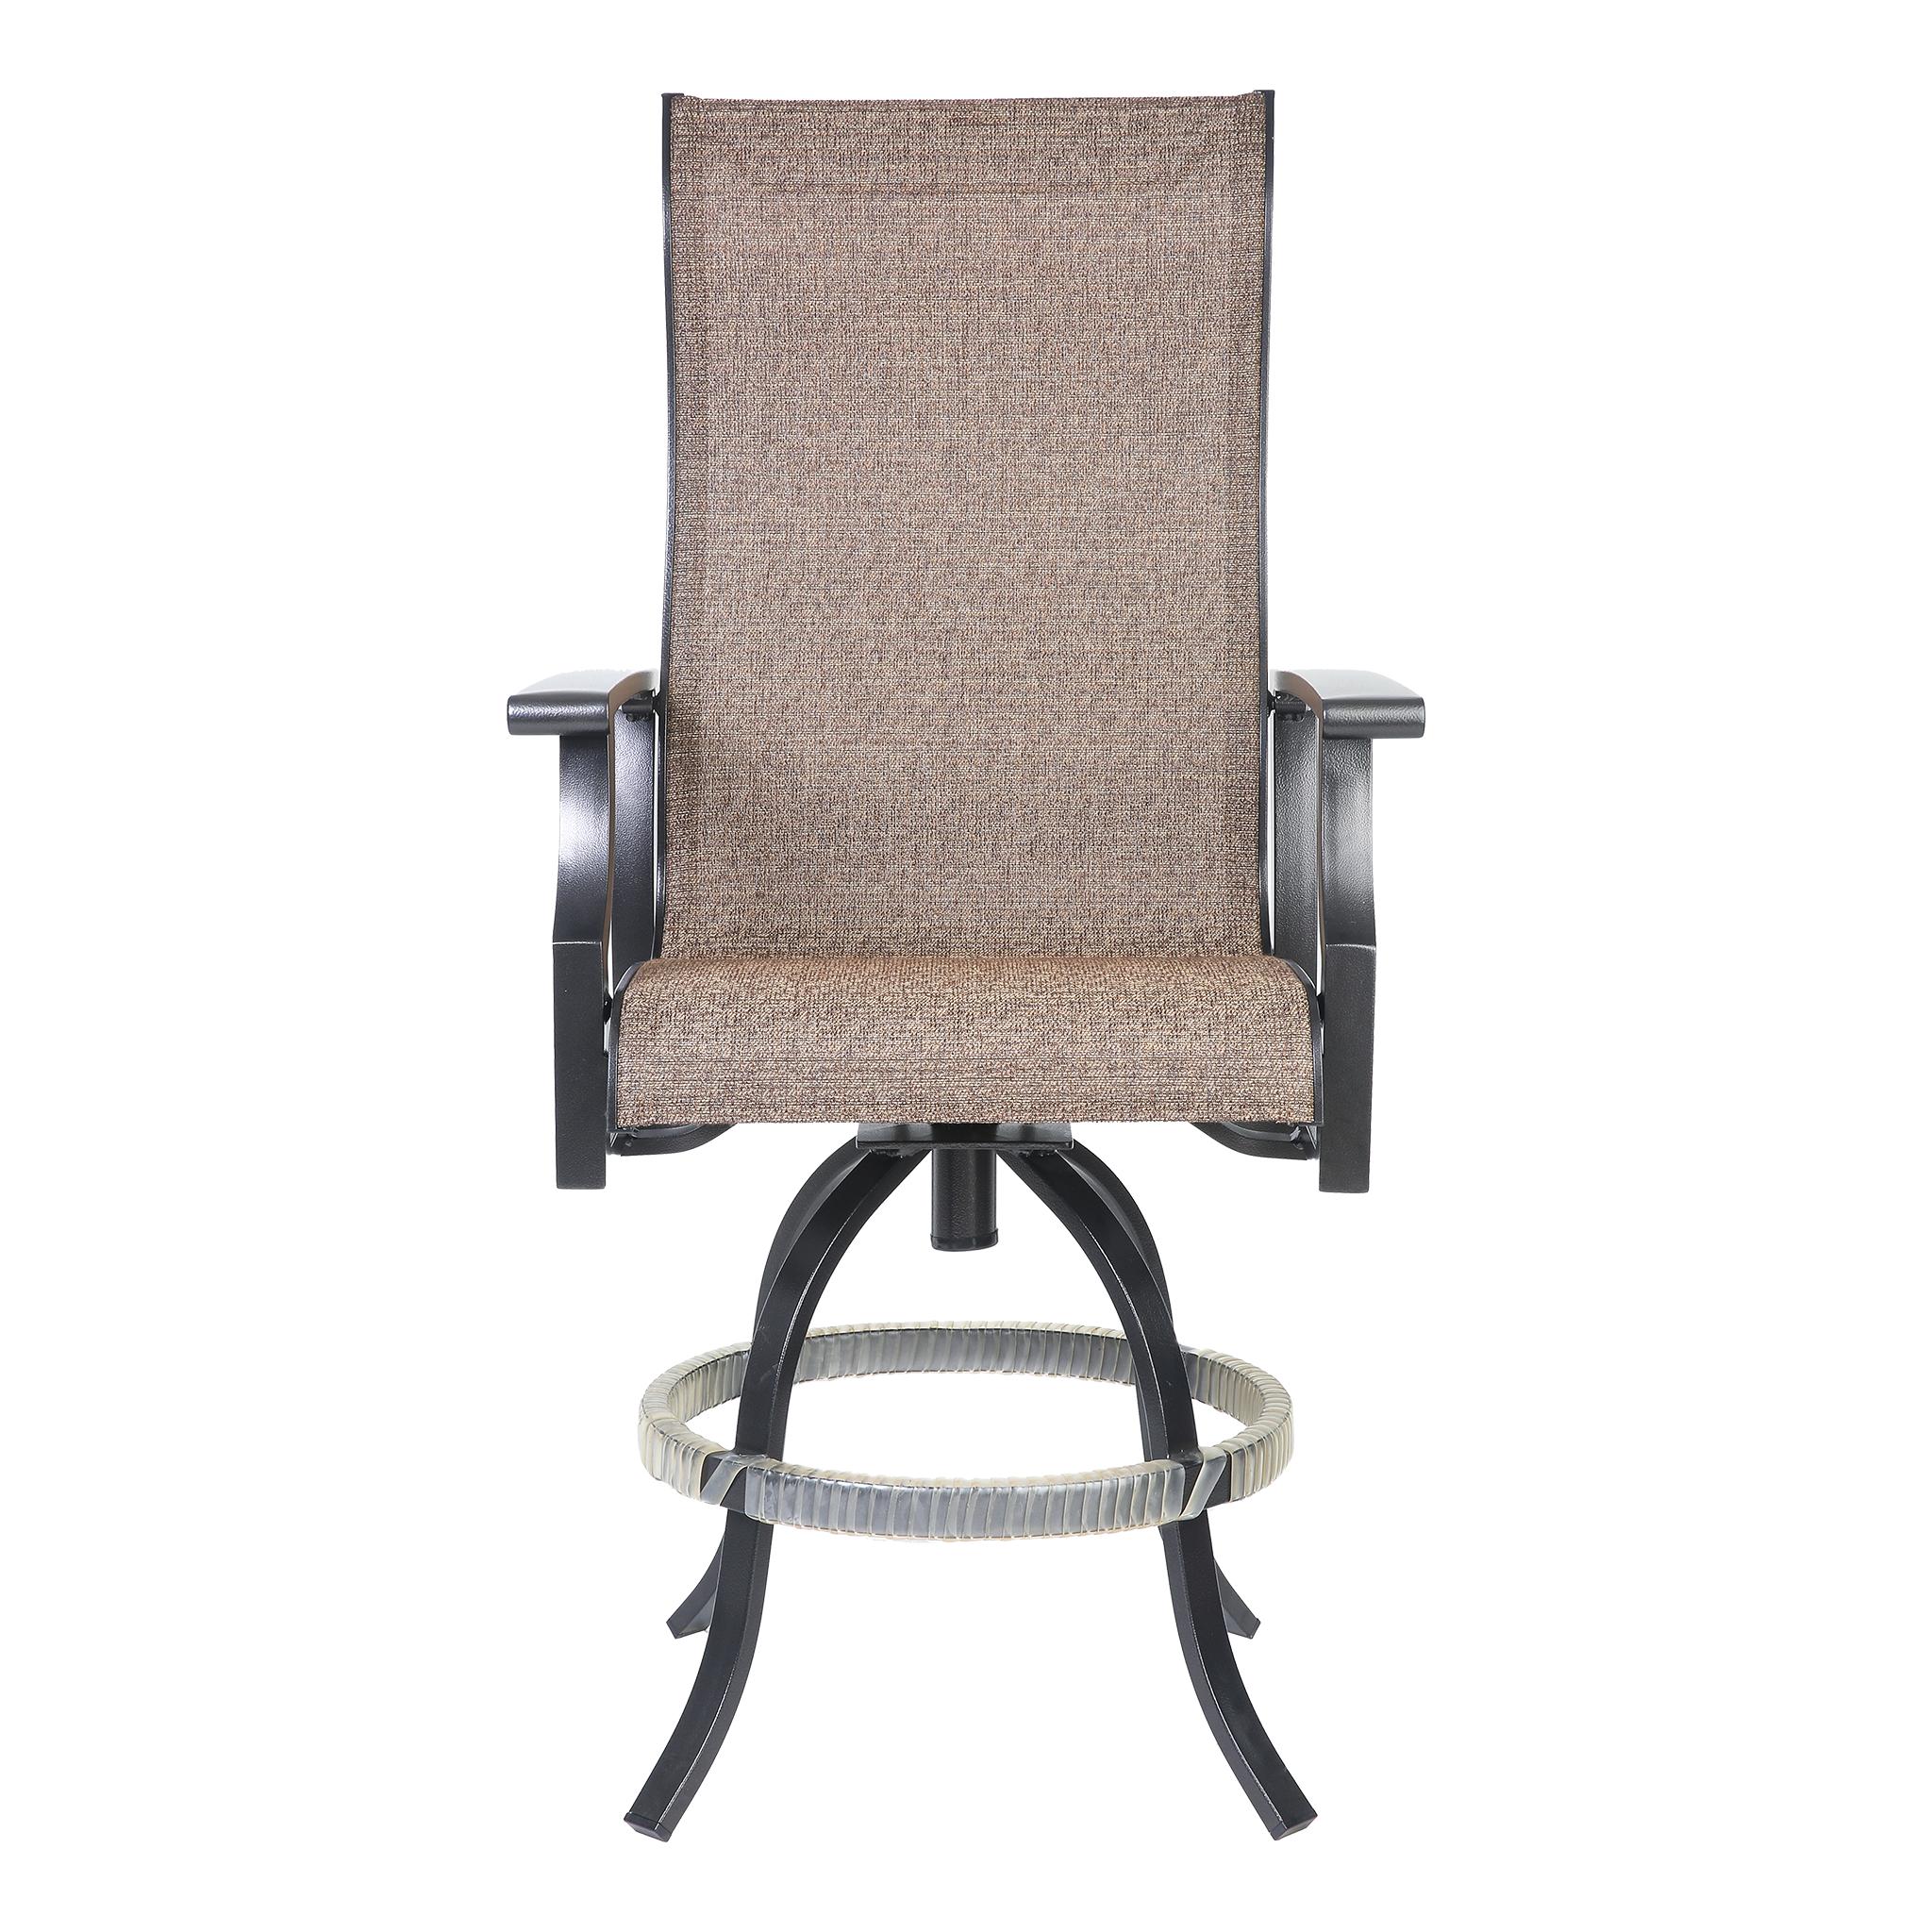 Bon Sunbrite Outdoor Furniture